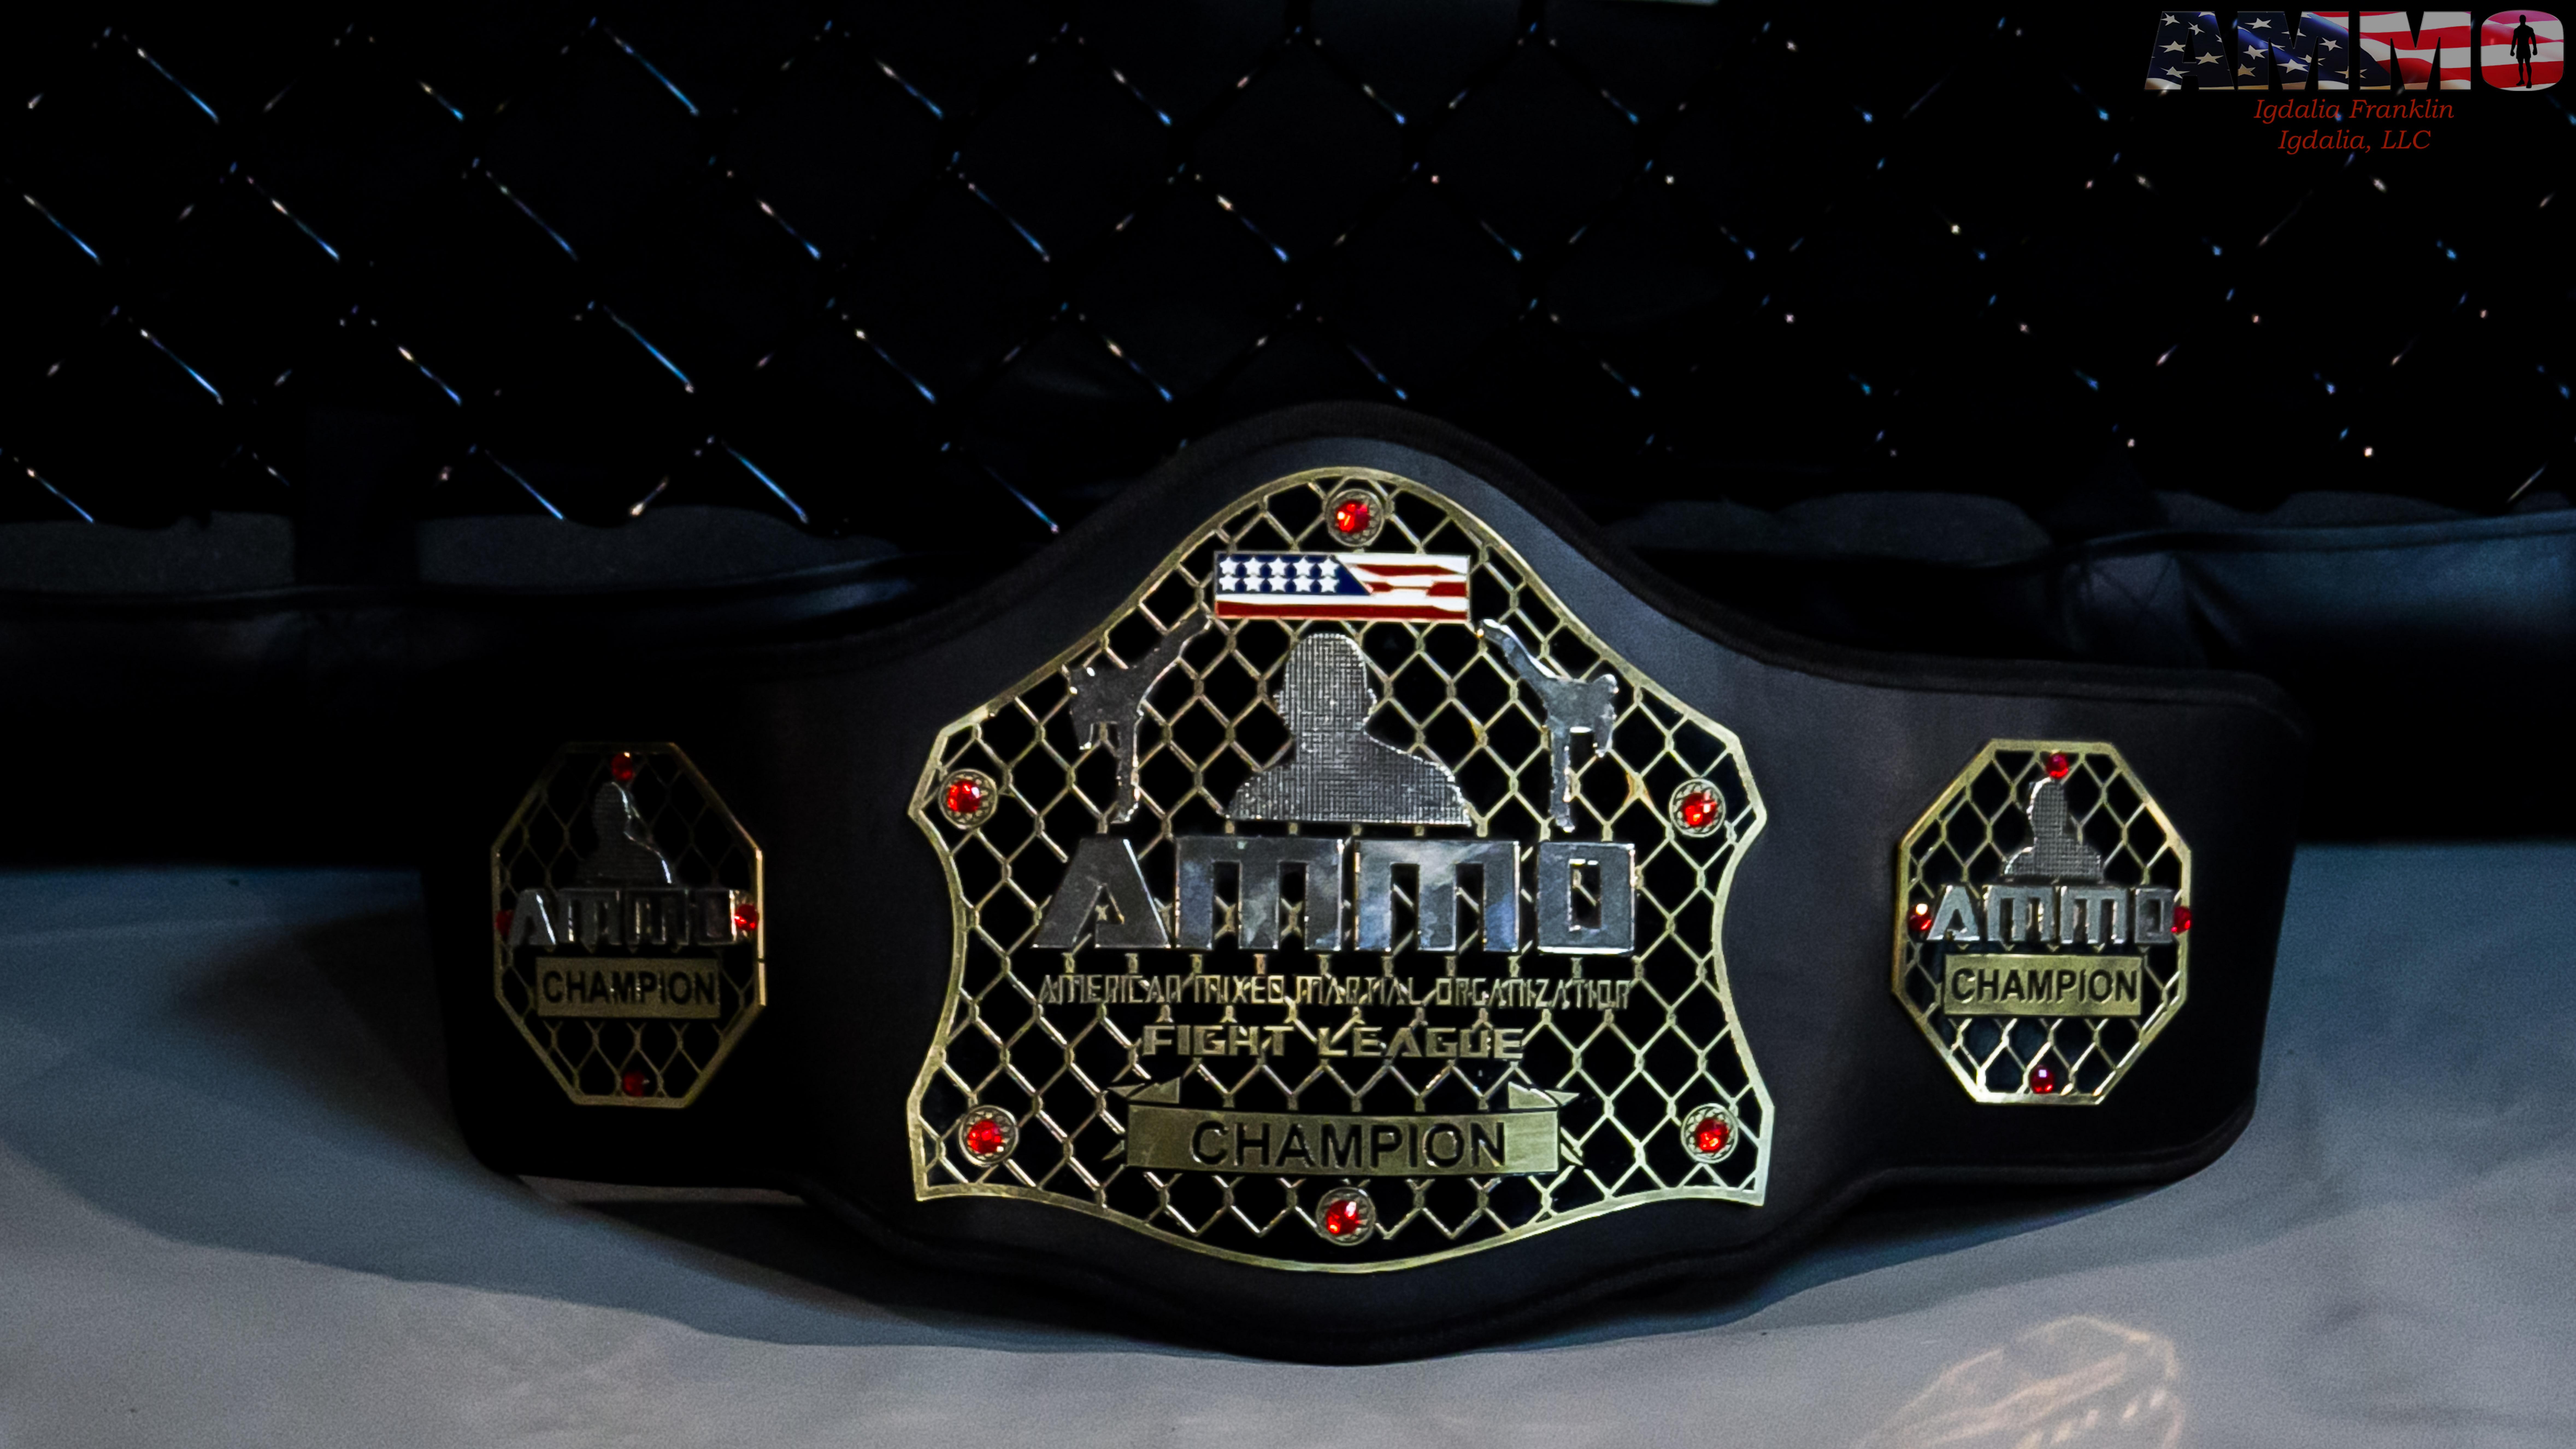 AMMO FL 10/13/18 Fight Night (Photo Credit: Igdalia Franklin/Igdalia LLC)